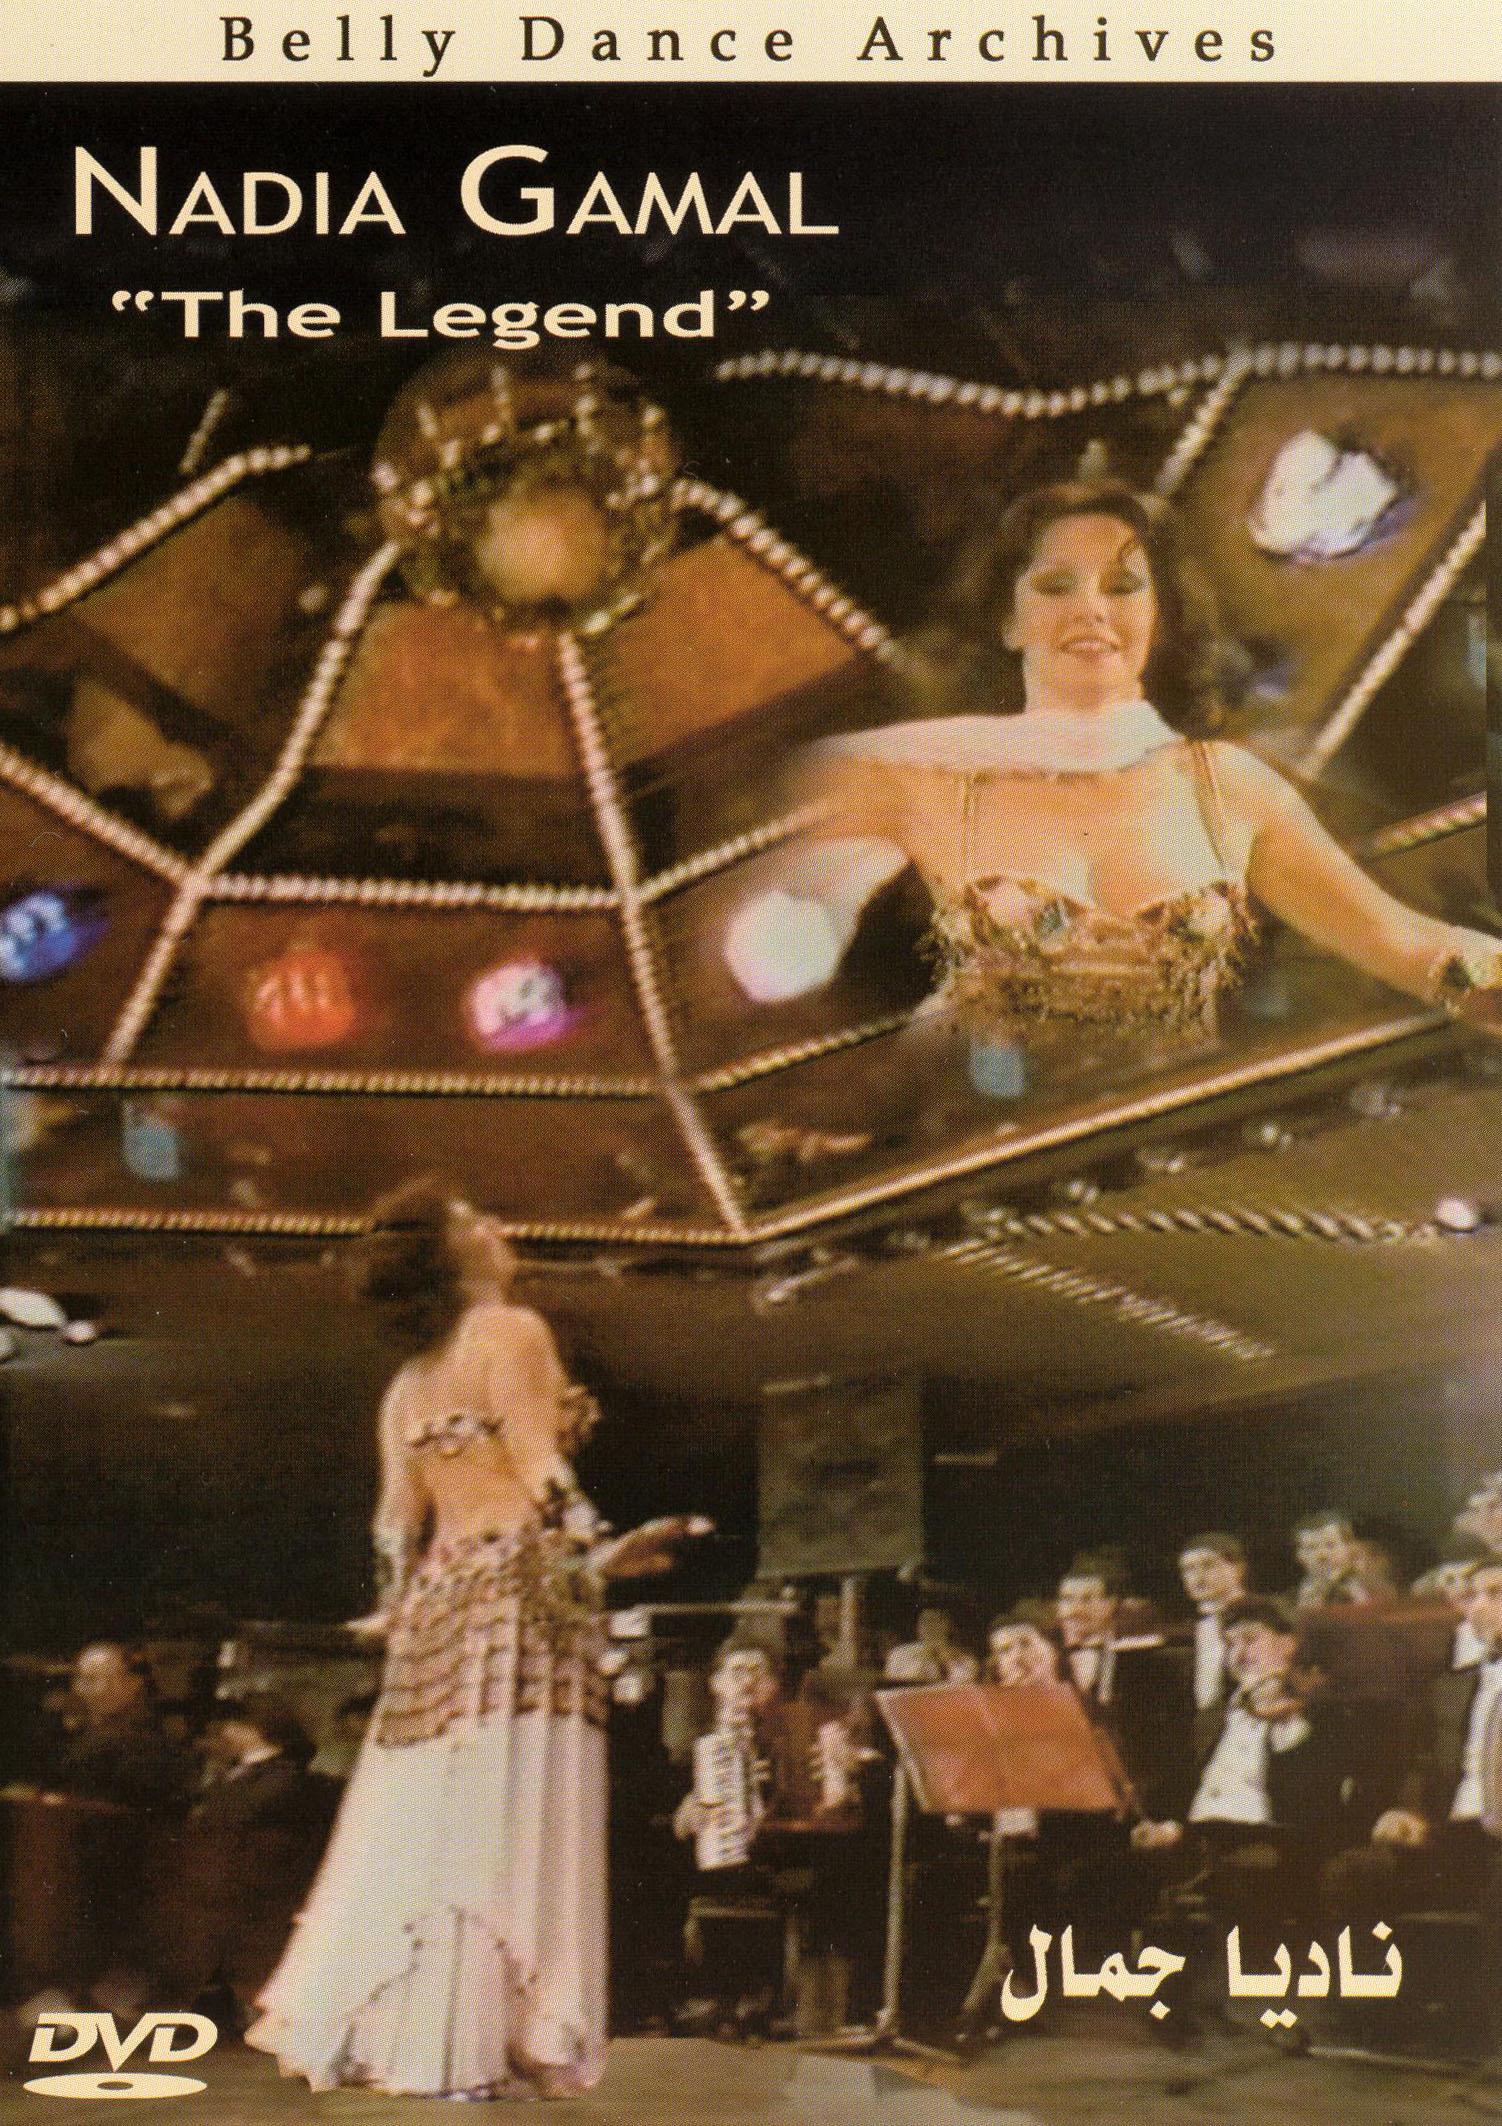 Nadia Gamal: The Legend